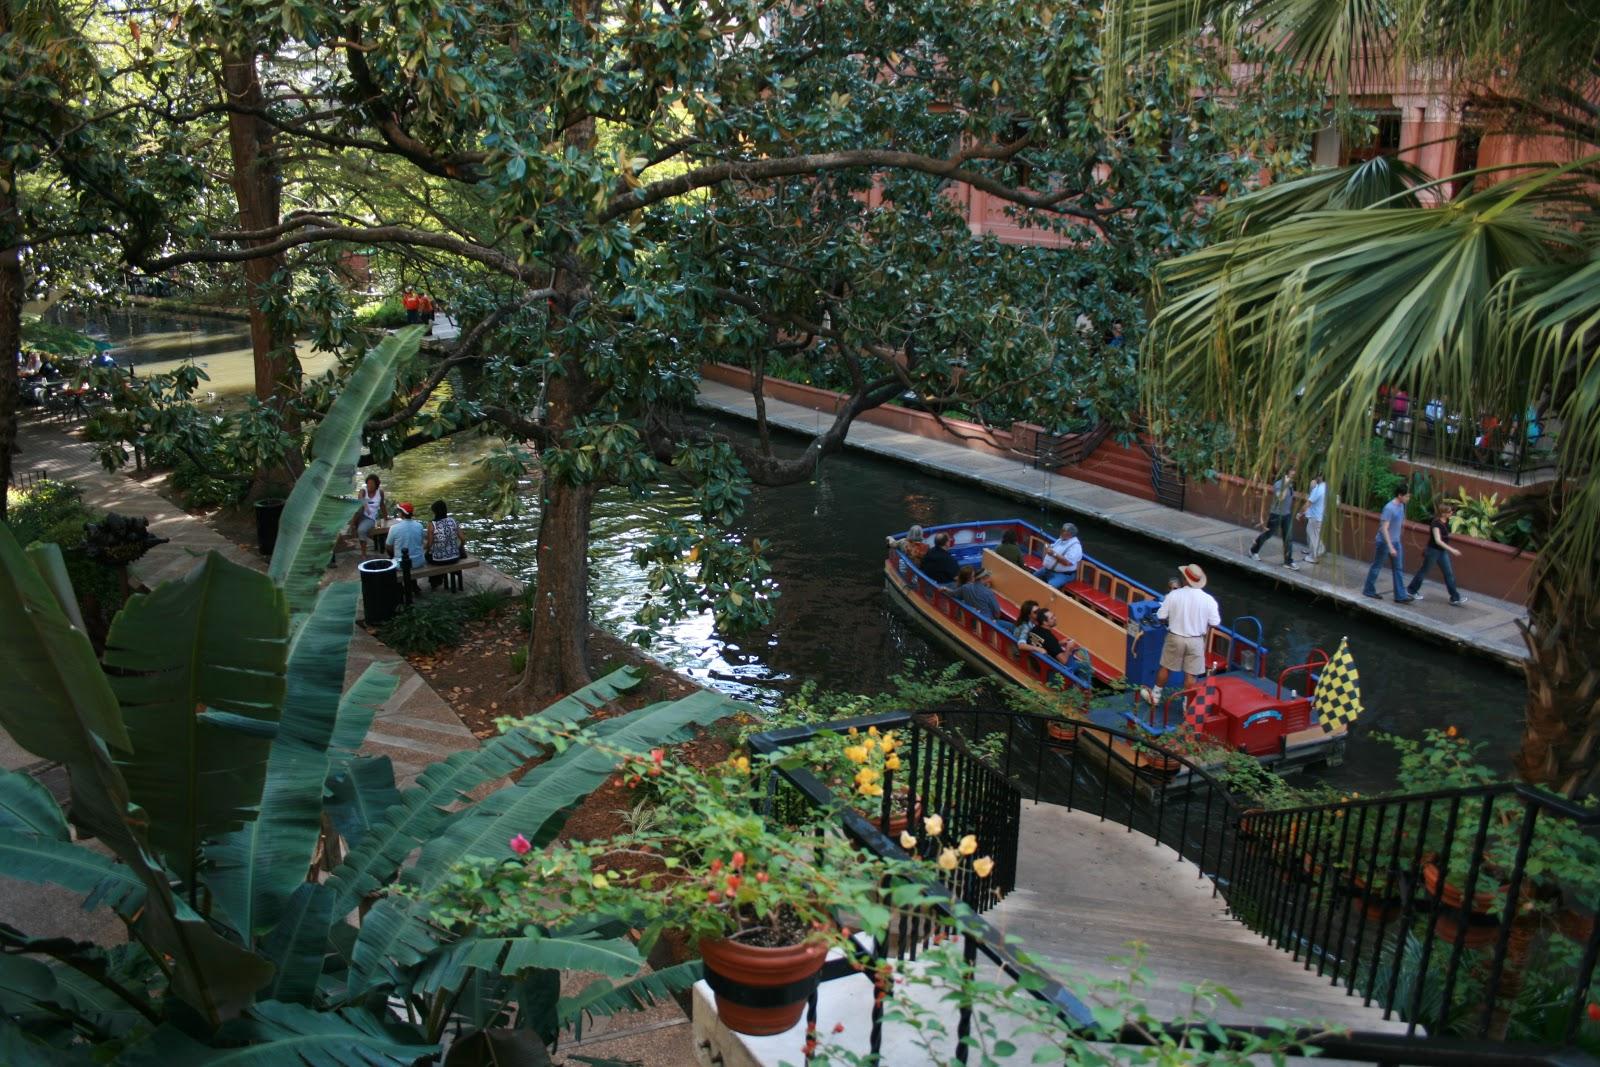 San Antonio Riverwalk Travelin With Jc